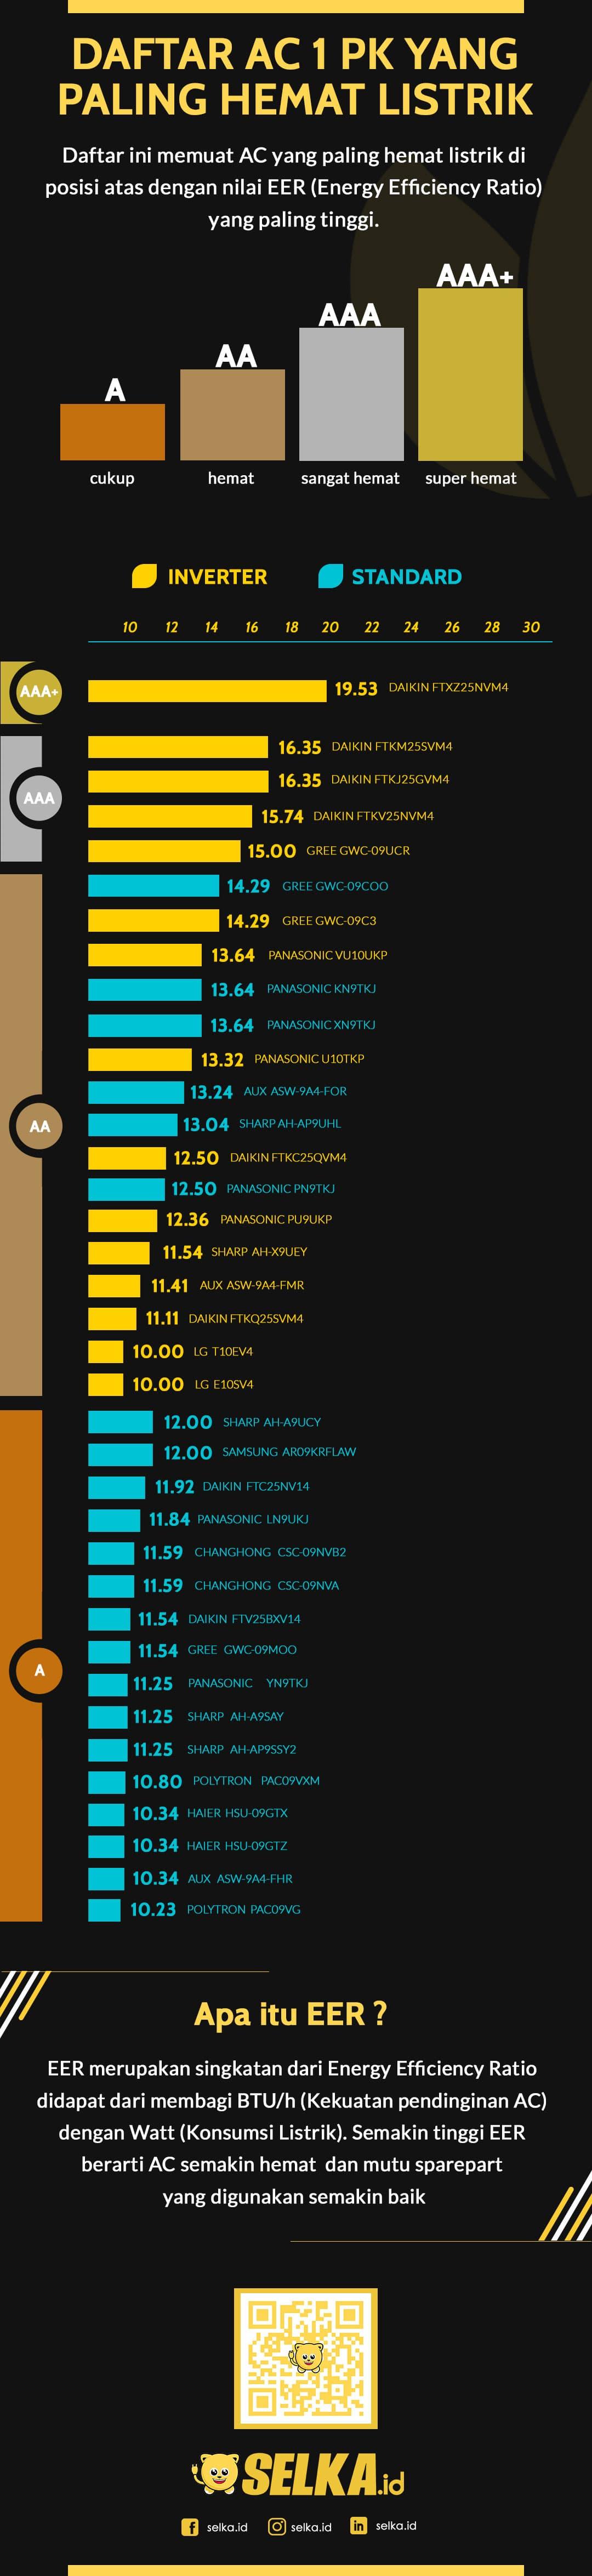 peringkat-top-40-ac-1-pk-hemat-listrik-infographics